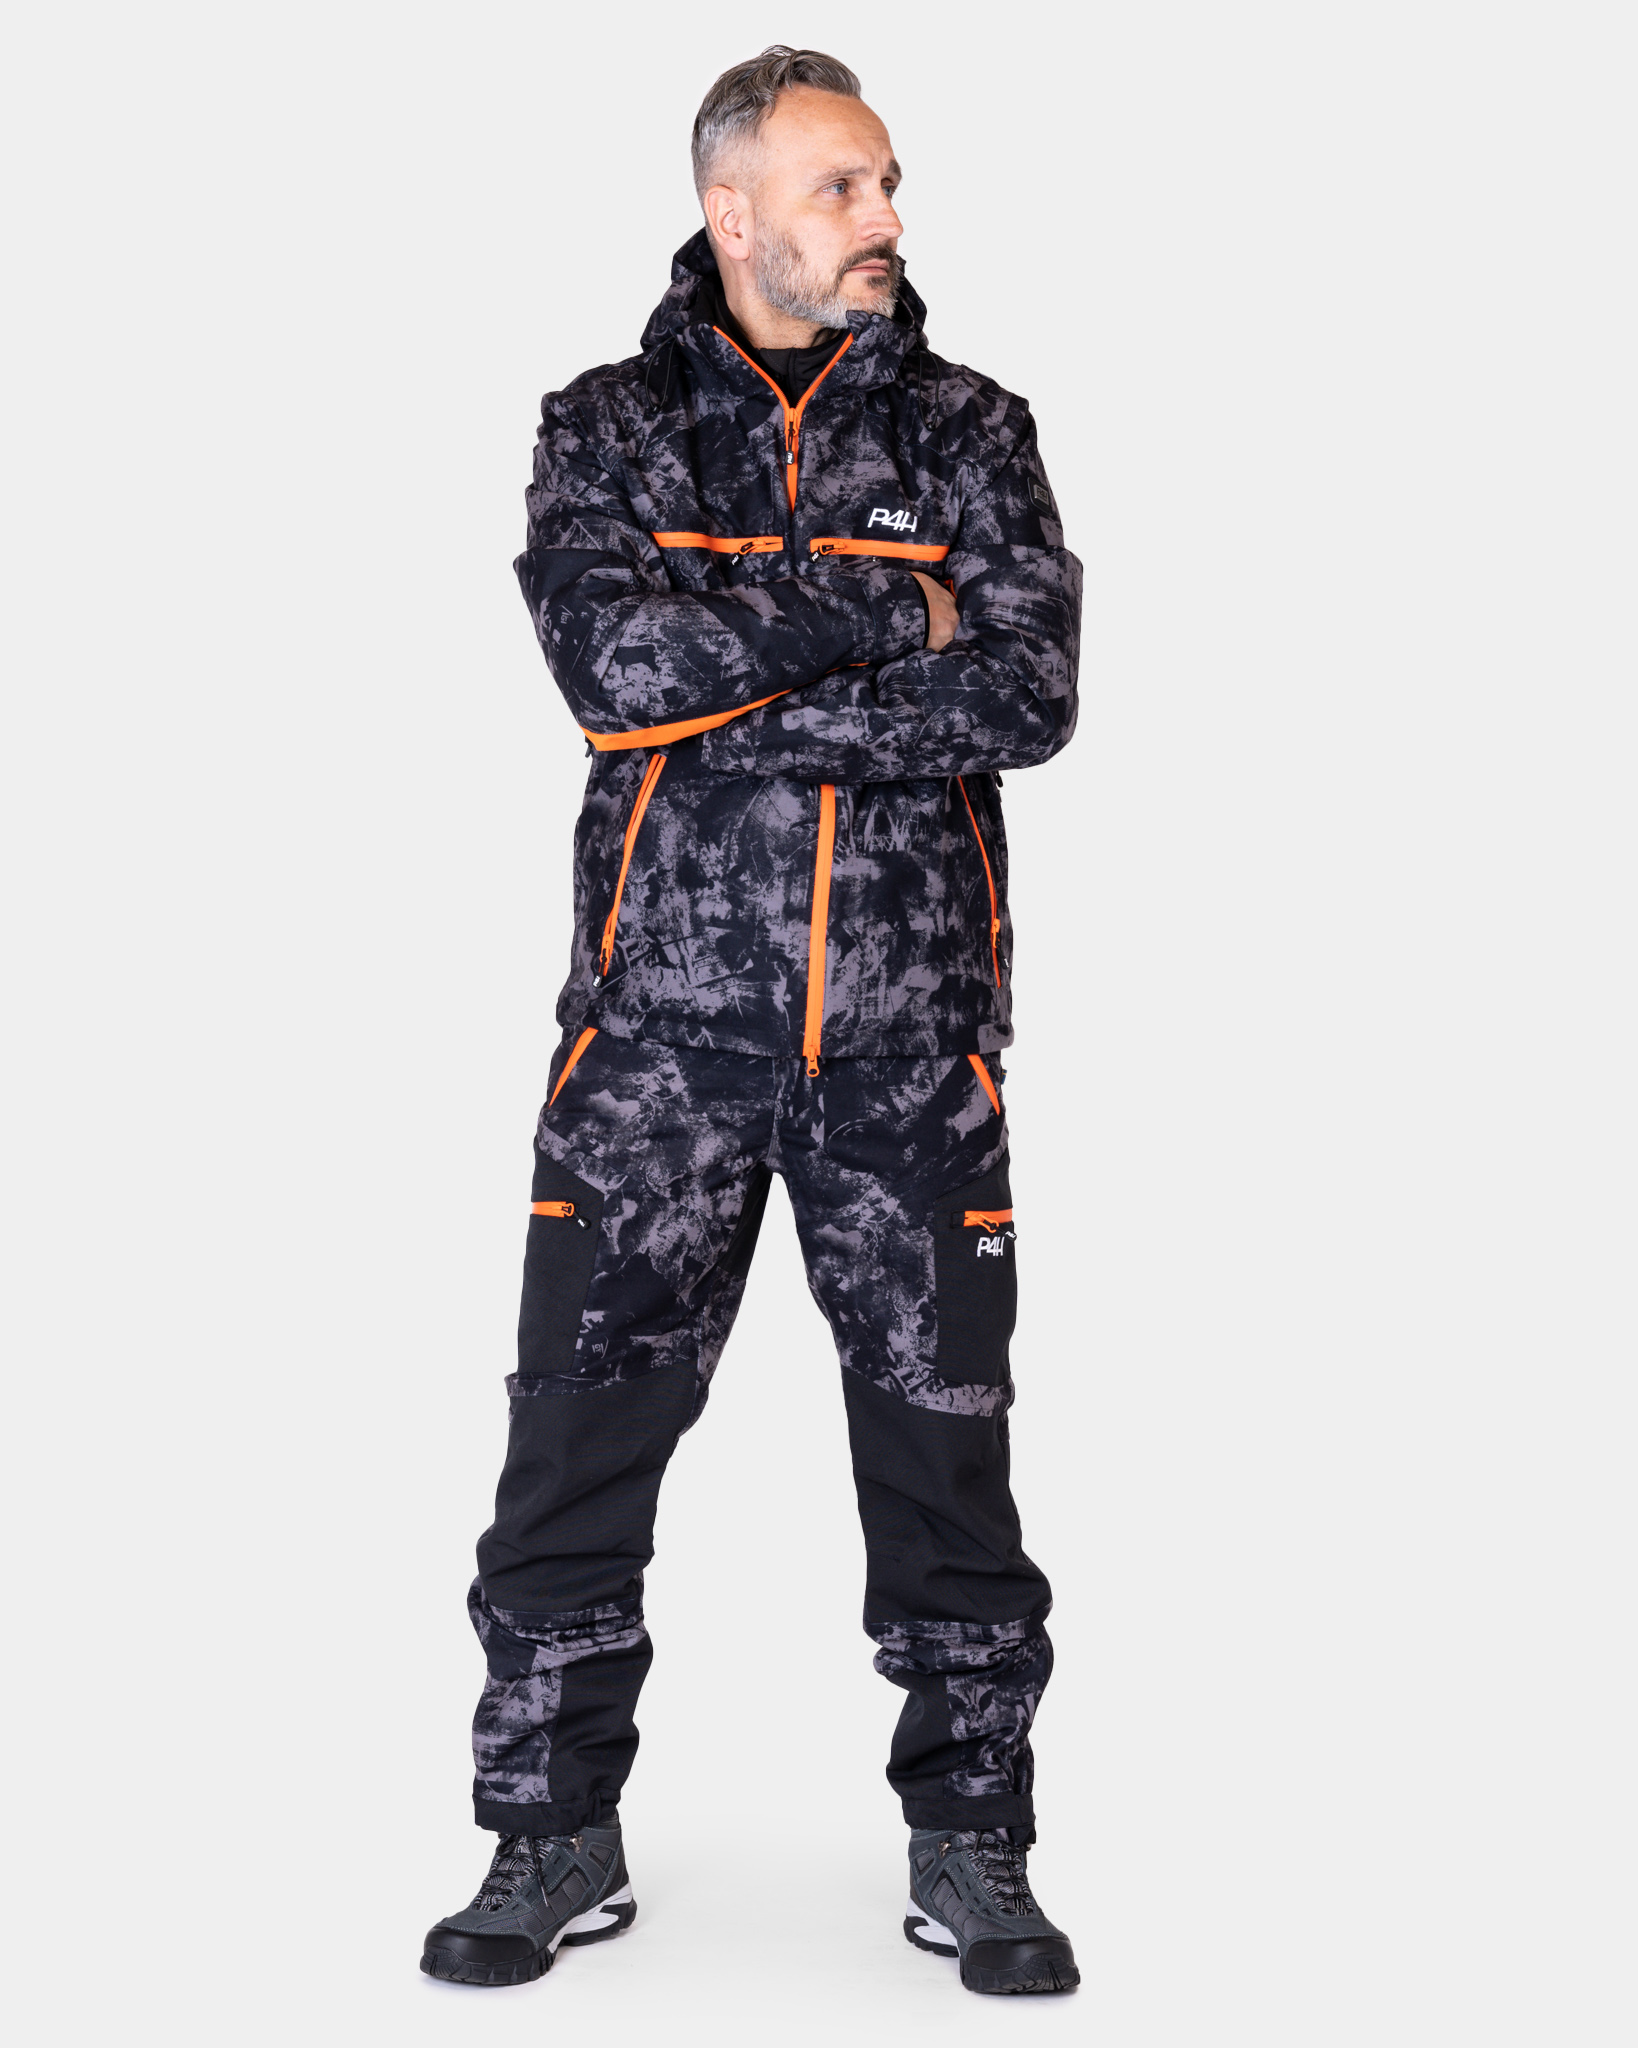 P4H Hunters Elite Jaktställ Black Camo, Herr